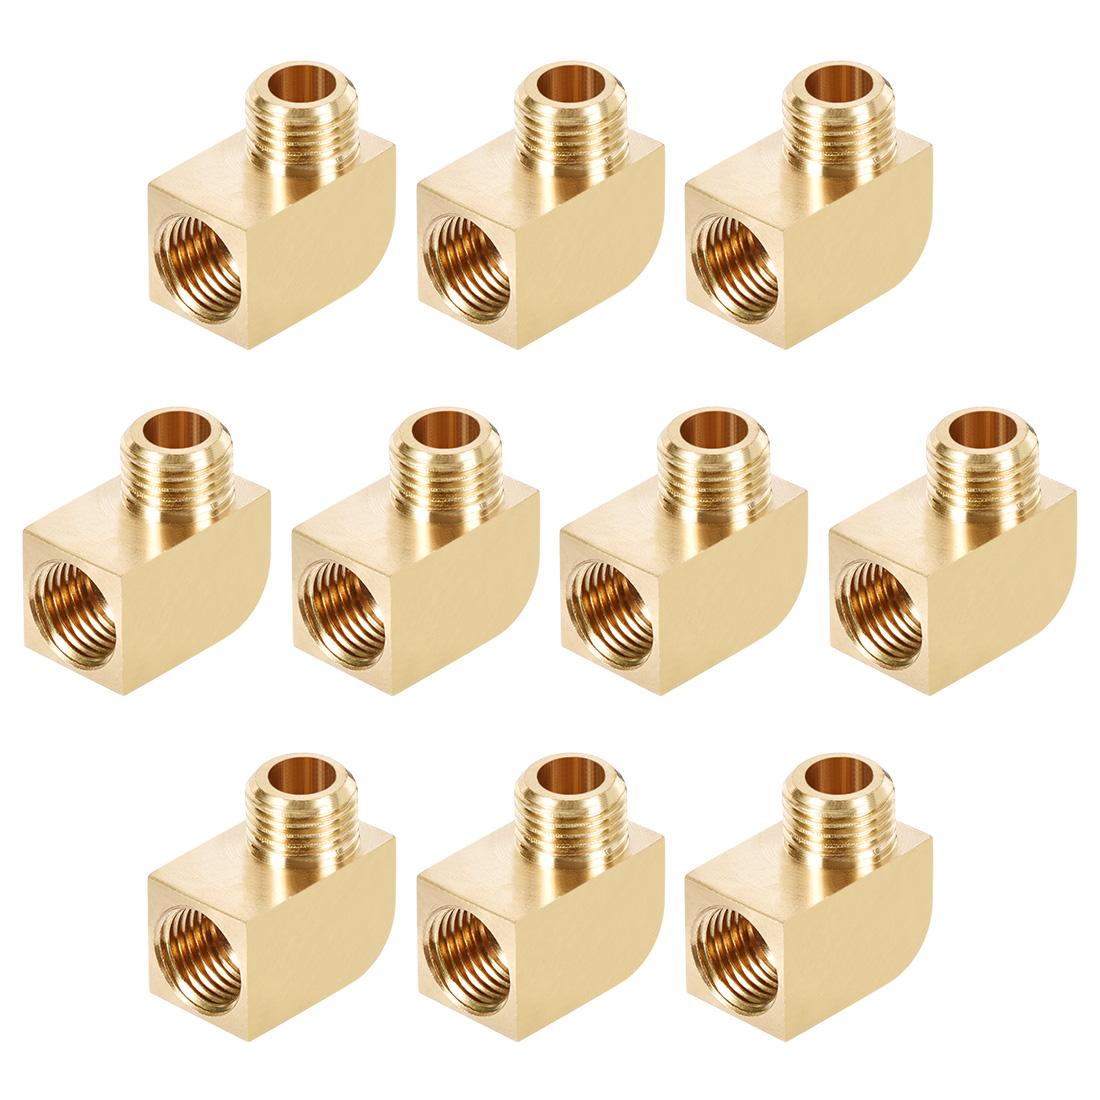 Brass Pipe Fitting 90 Degree Barstock Street Elbow M10 Male x M10 Female 10pcs